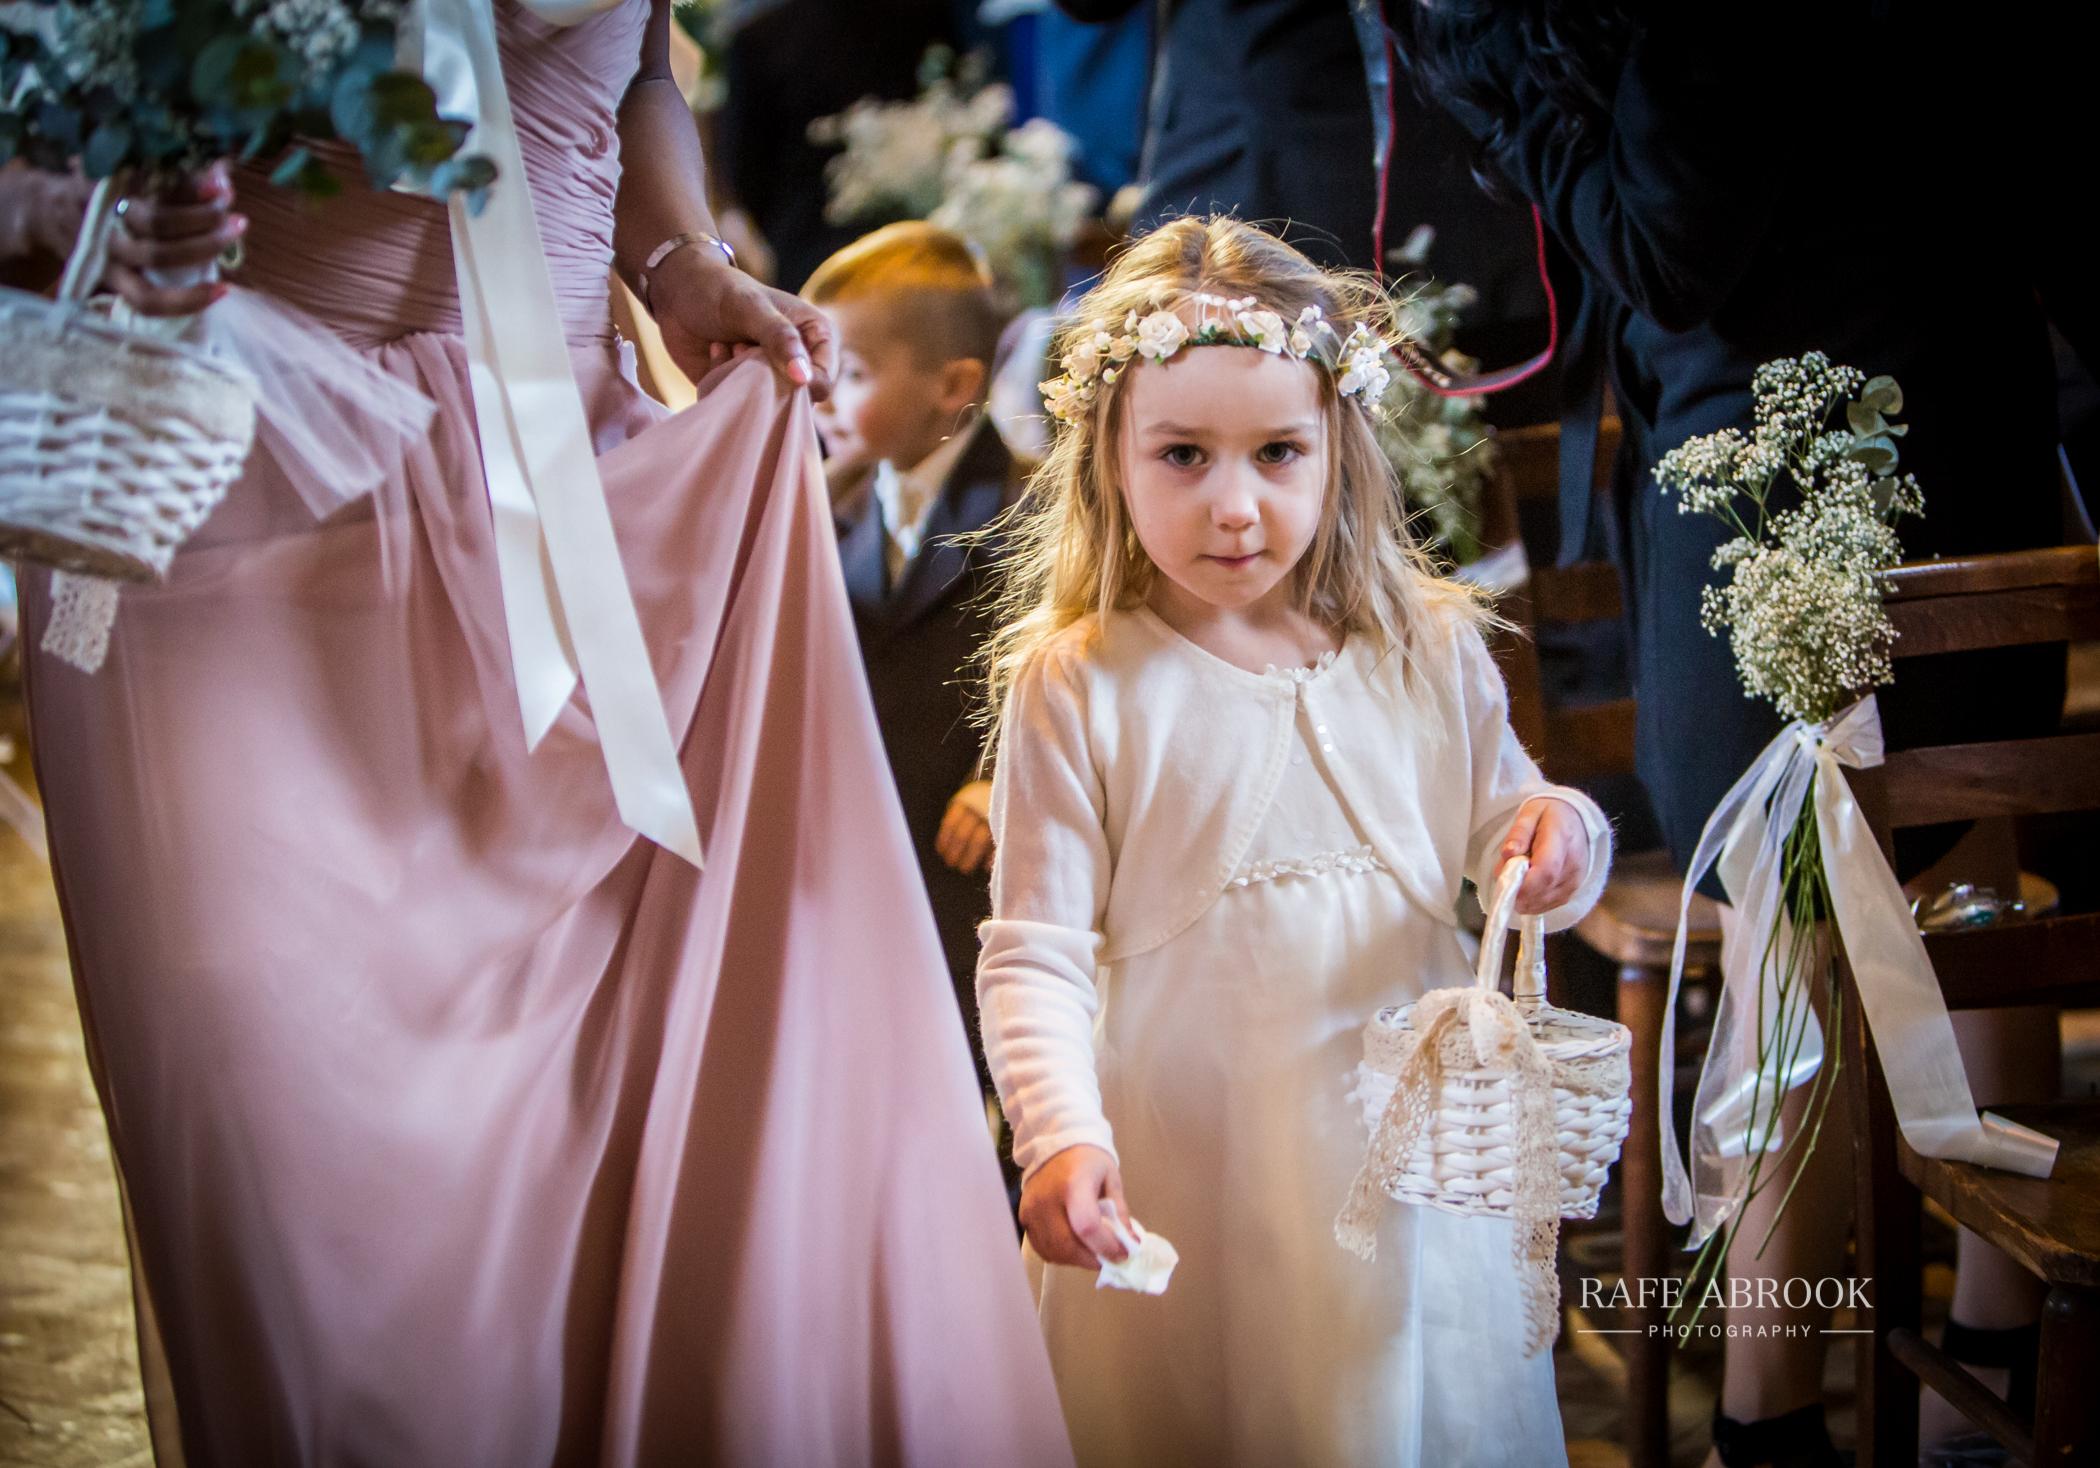 roma & pete wedding hampstead shenley hertfordshire -136.jpg